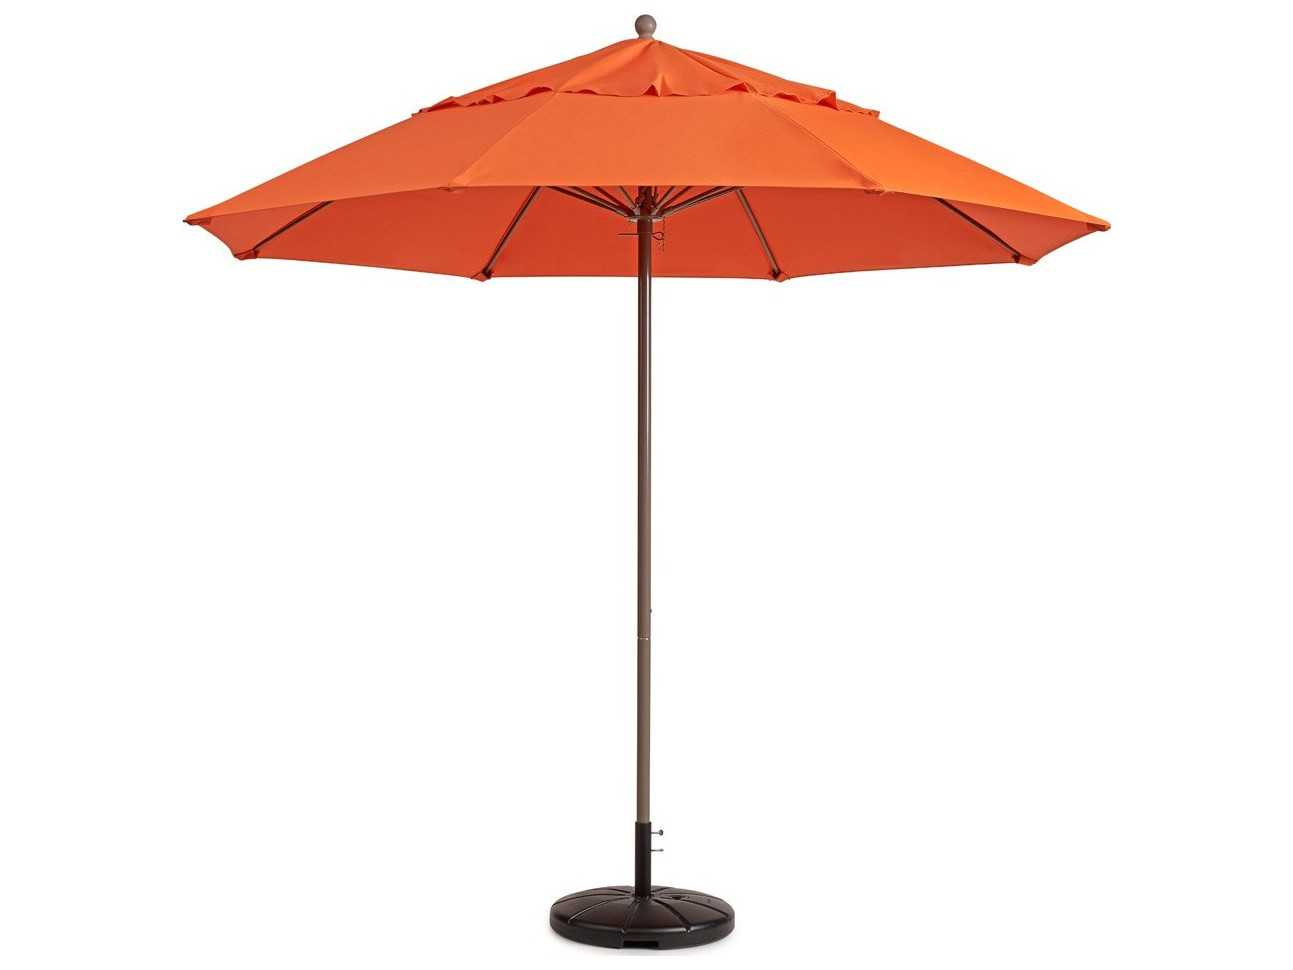 Grosfillex Windmaster 7 5 Foot Fiberglass Umbrella 98301931